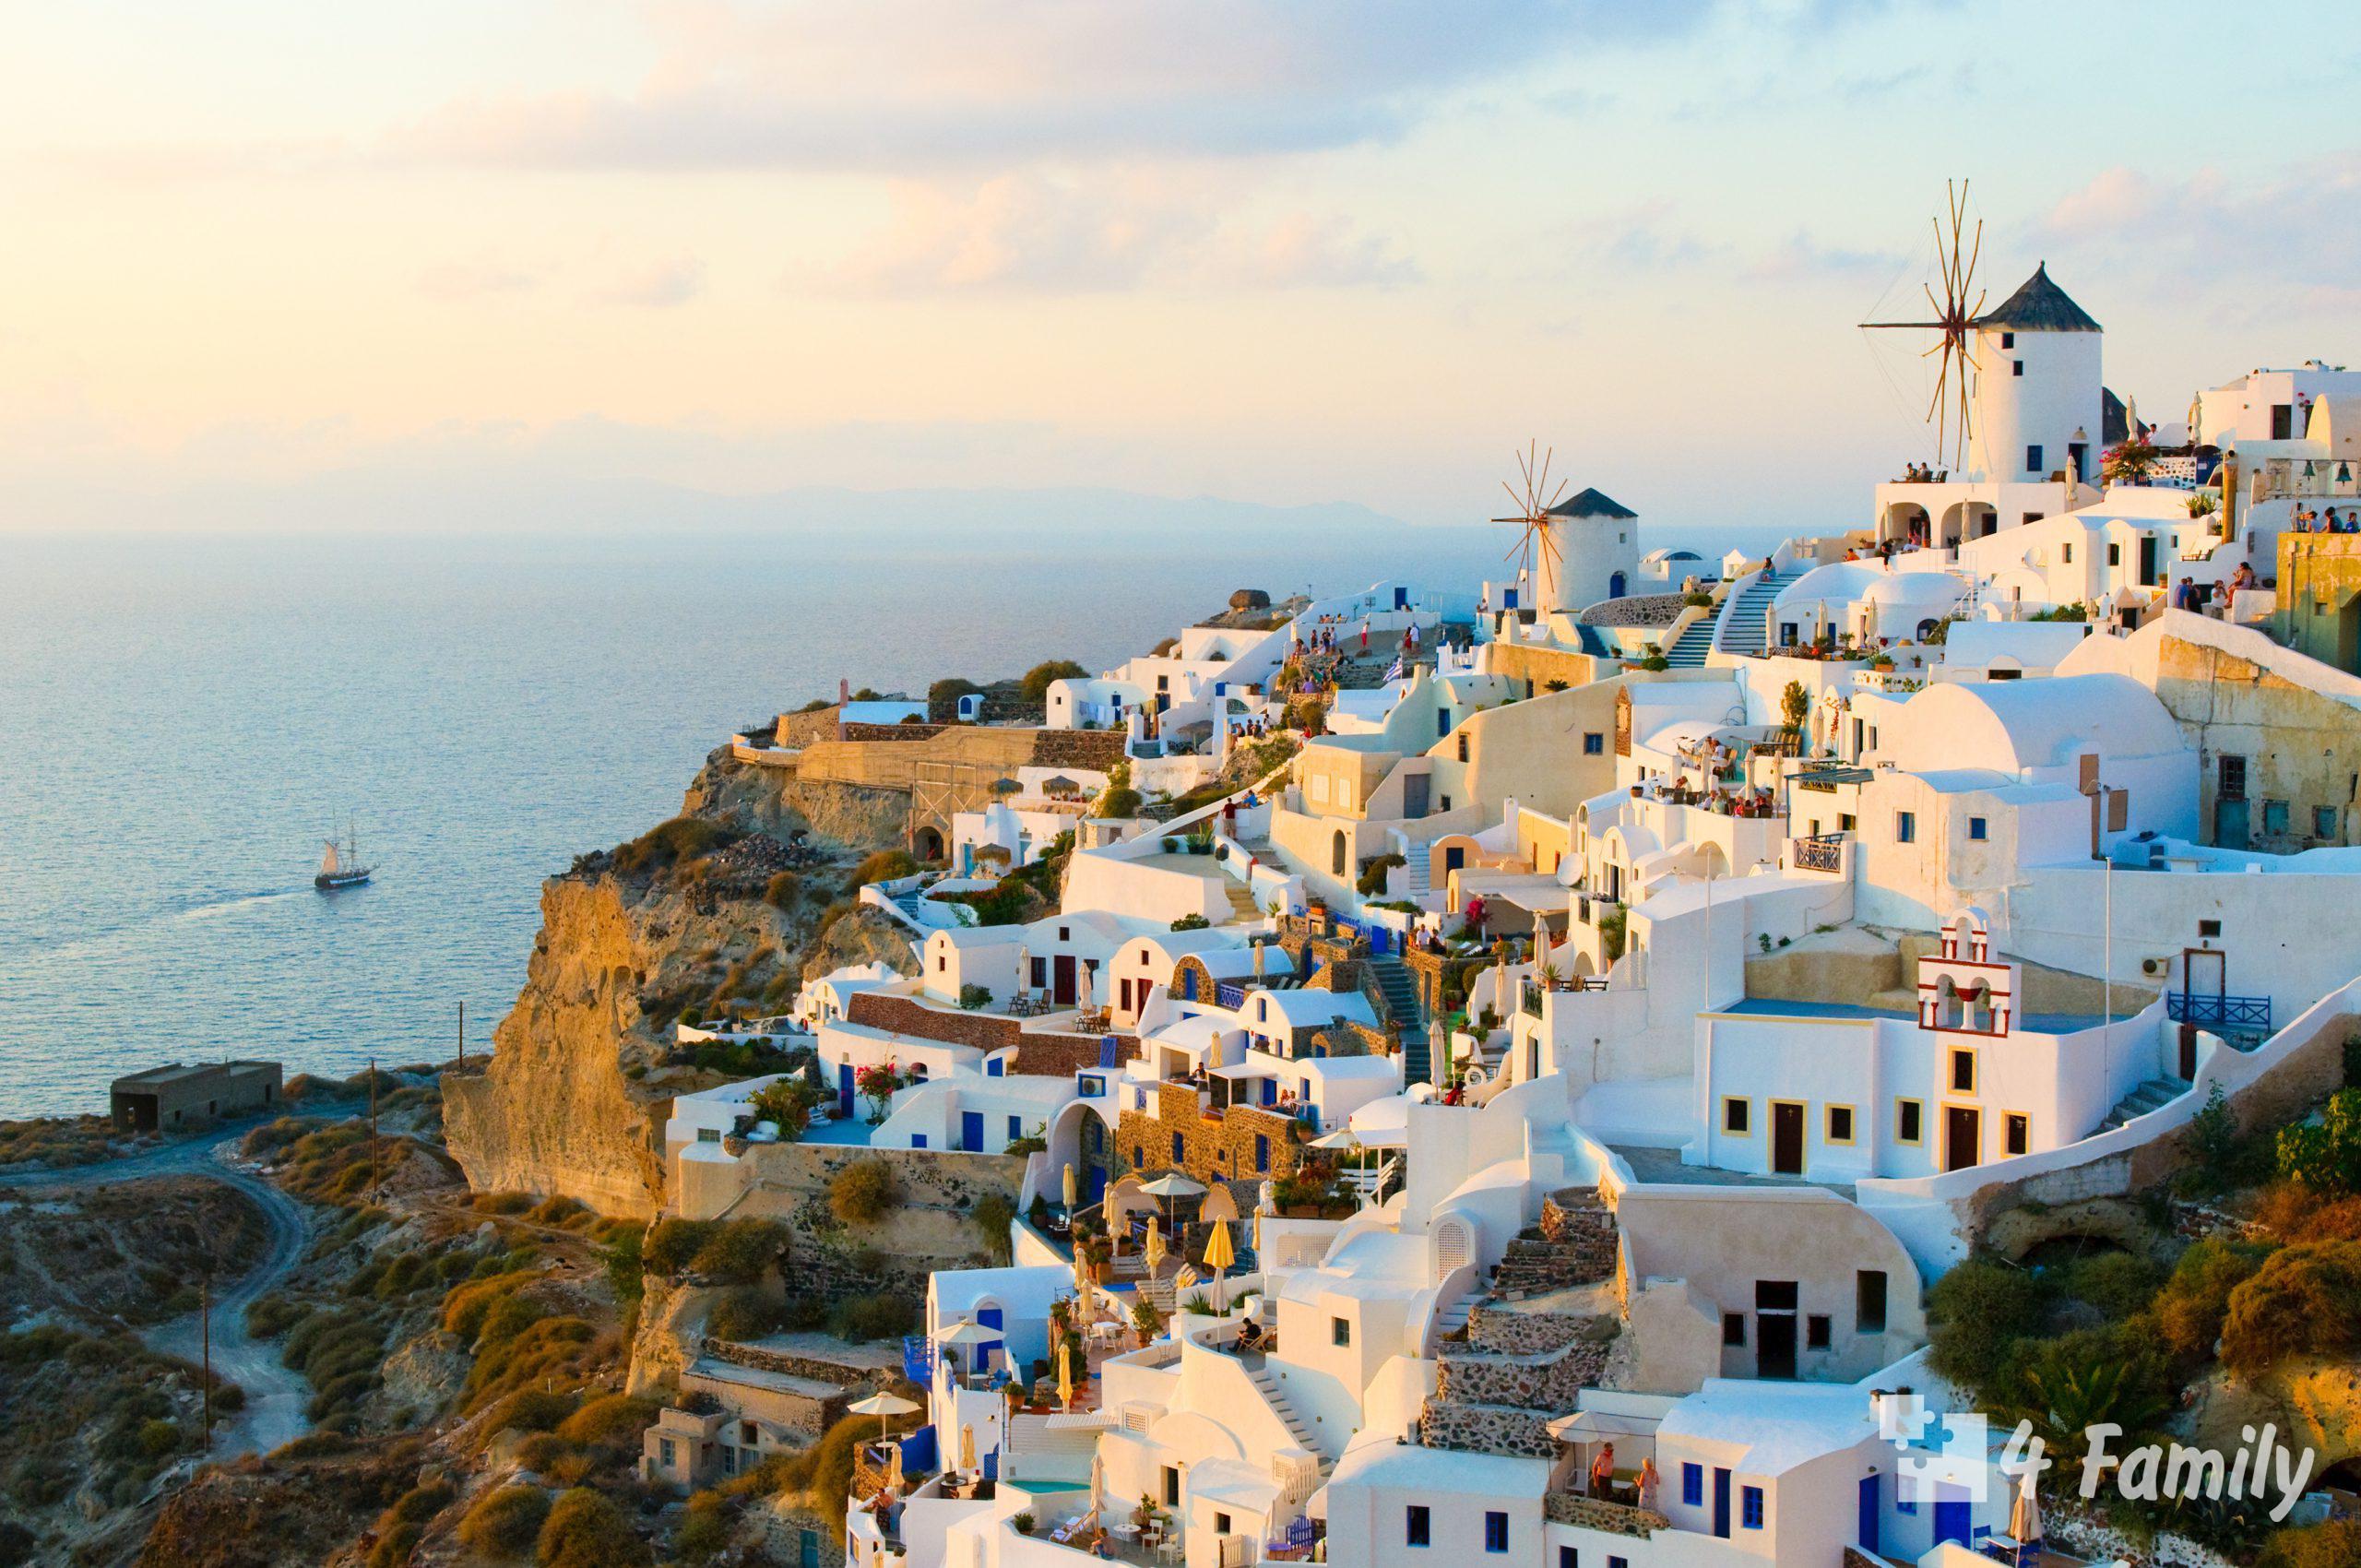 4family Достопримечательности Греции